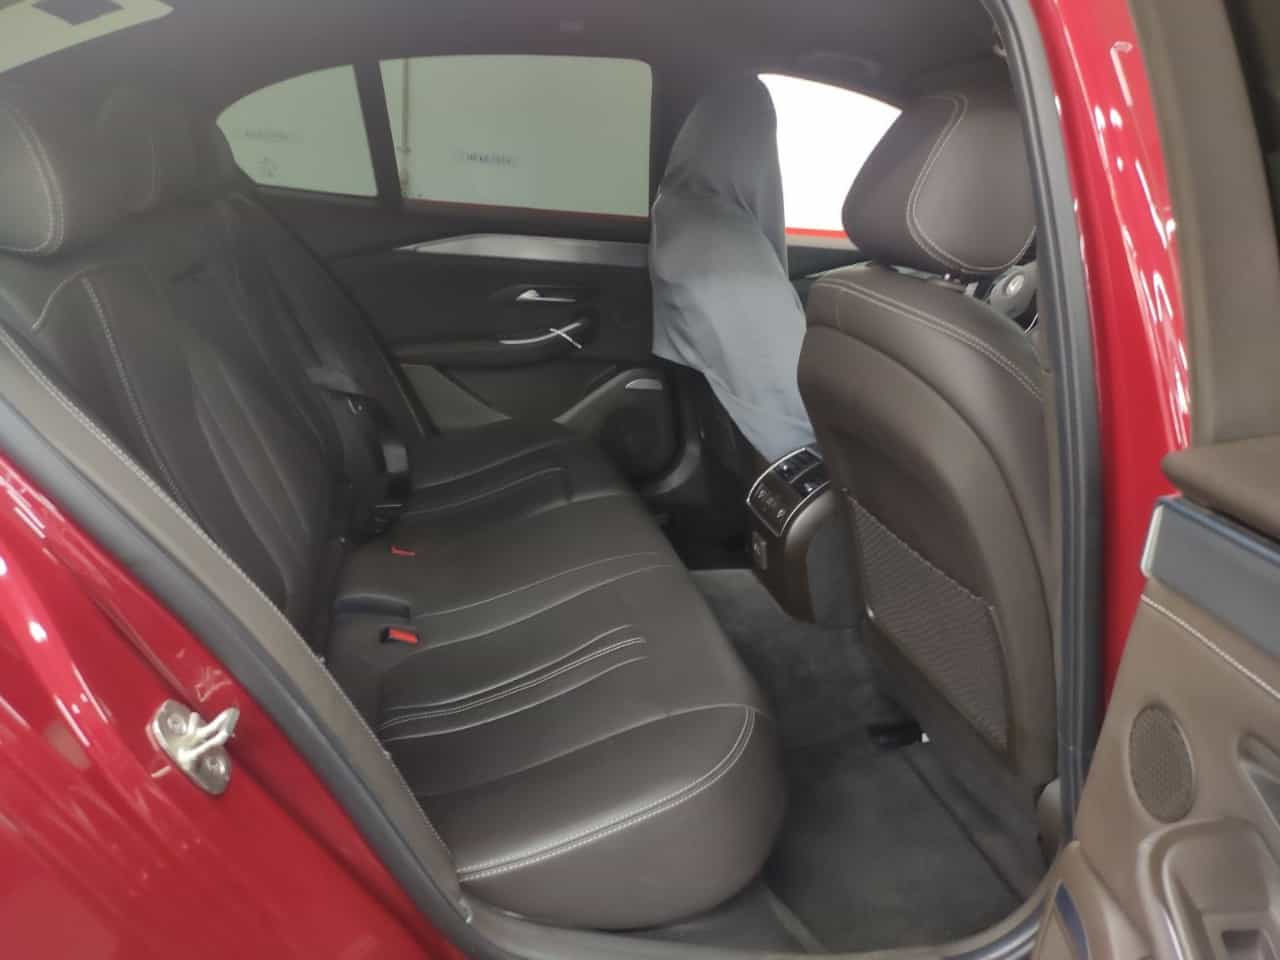 hàng ghế sau nội thất da nappa đen của VinFast Lux A2.0 bản cao cấp (premium)